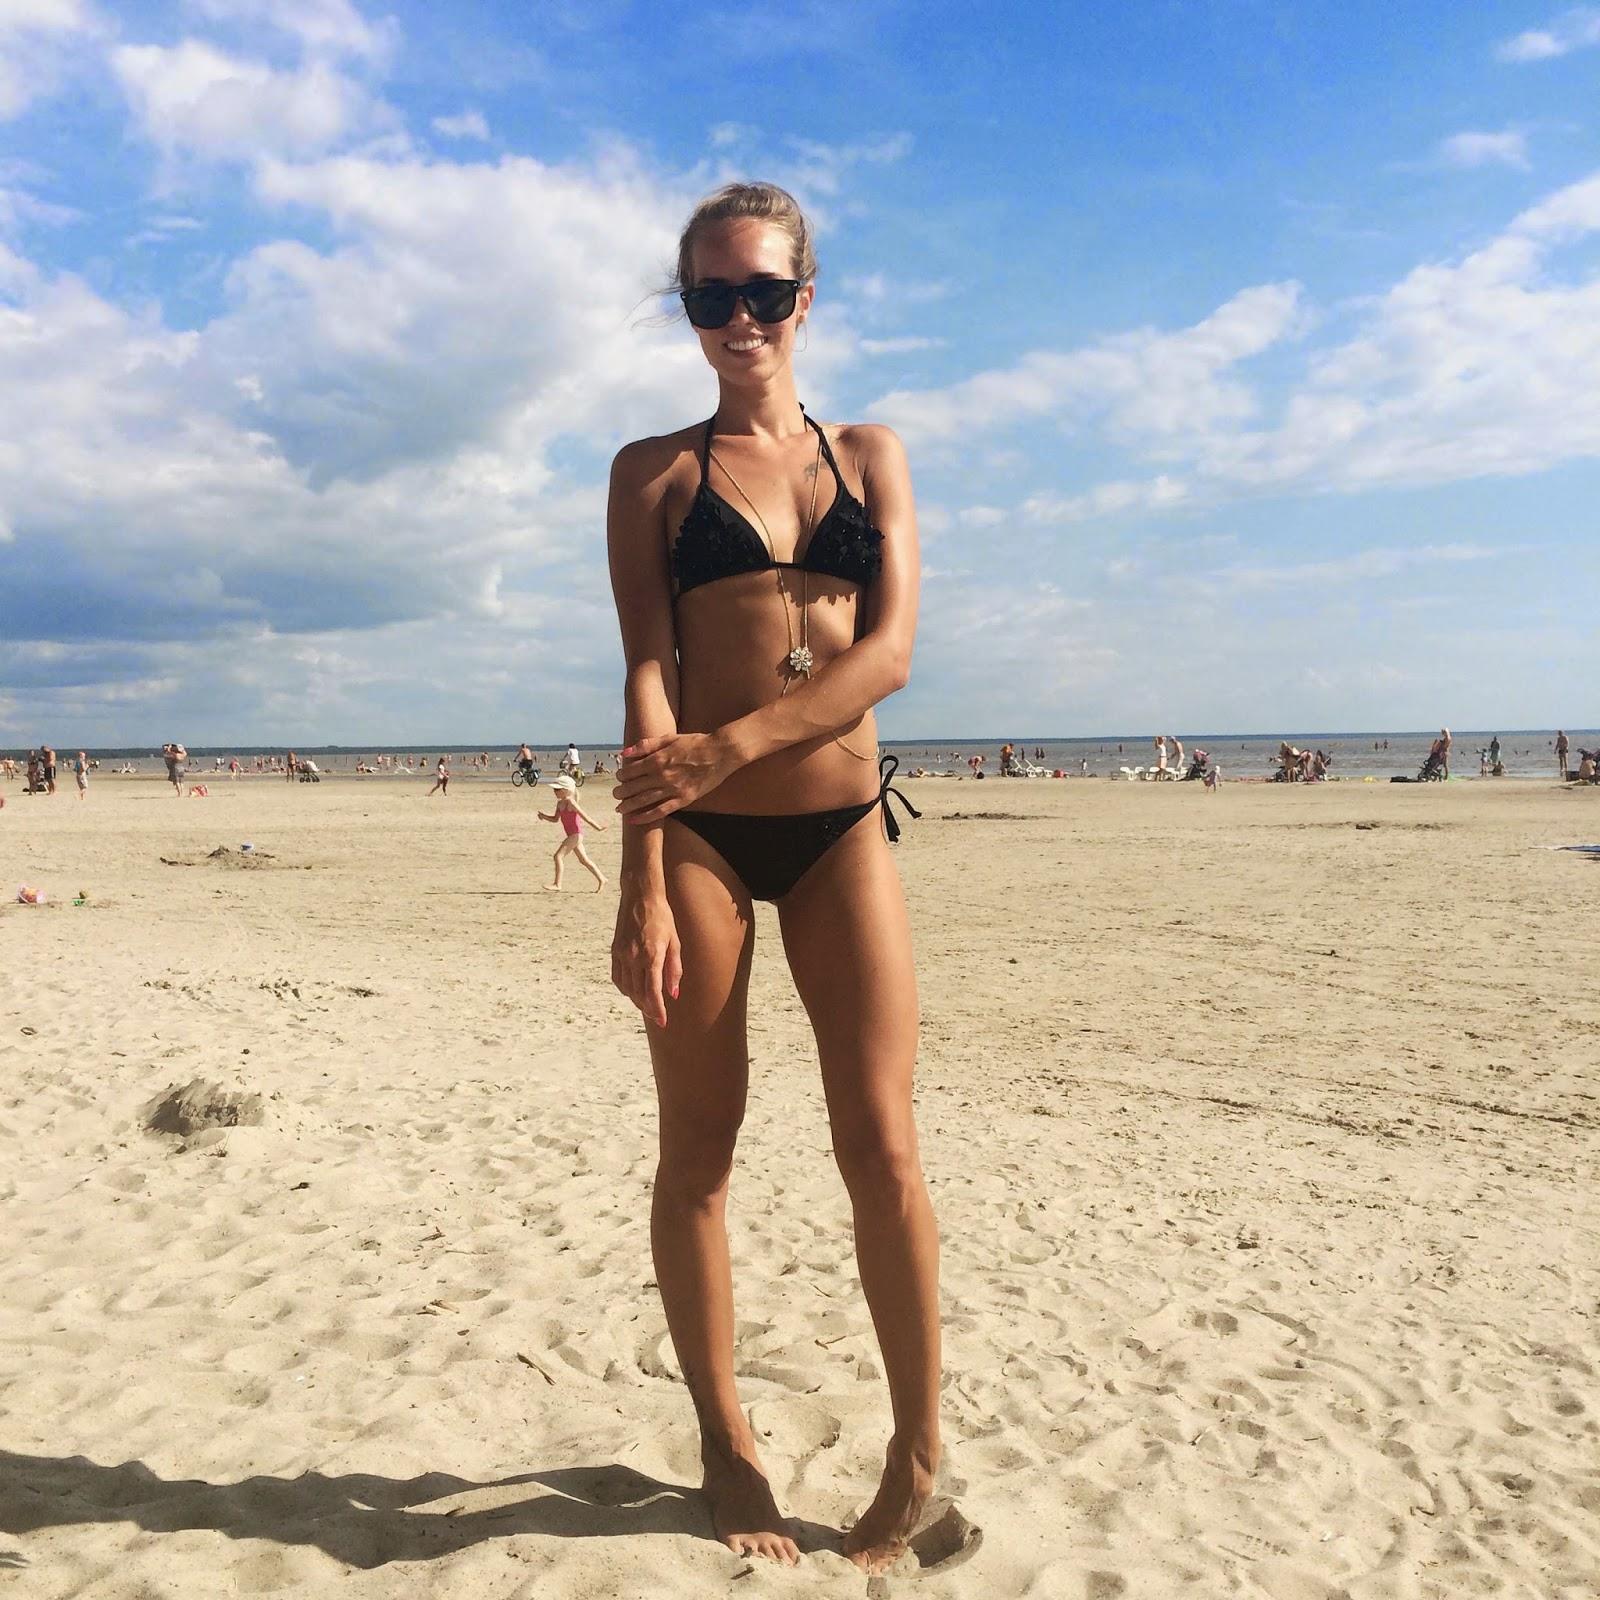 hm blck bikini river island body chain